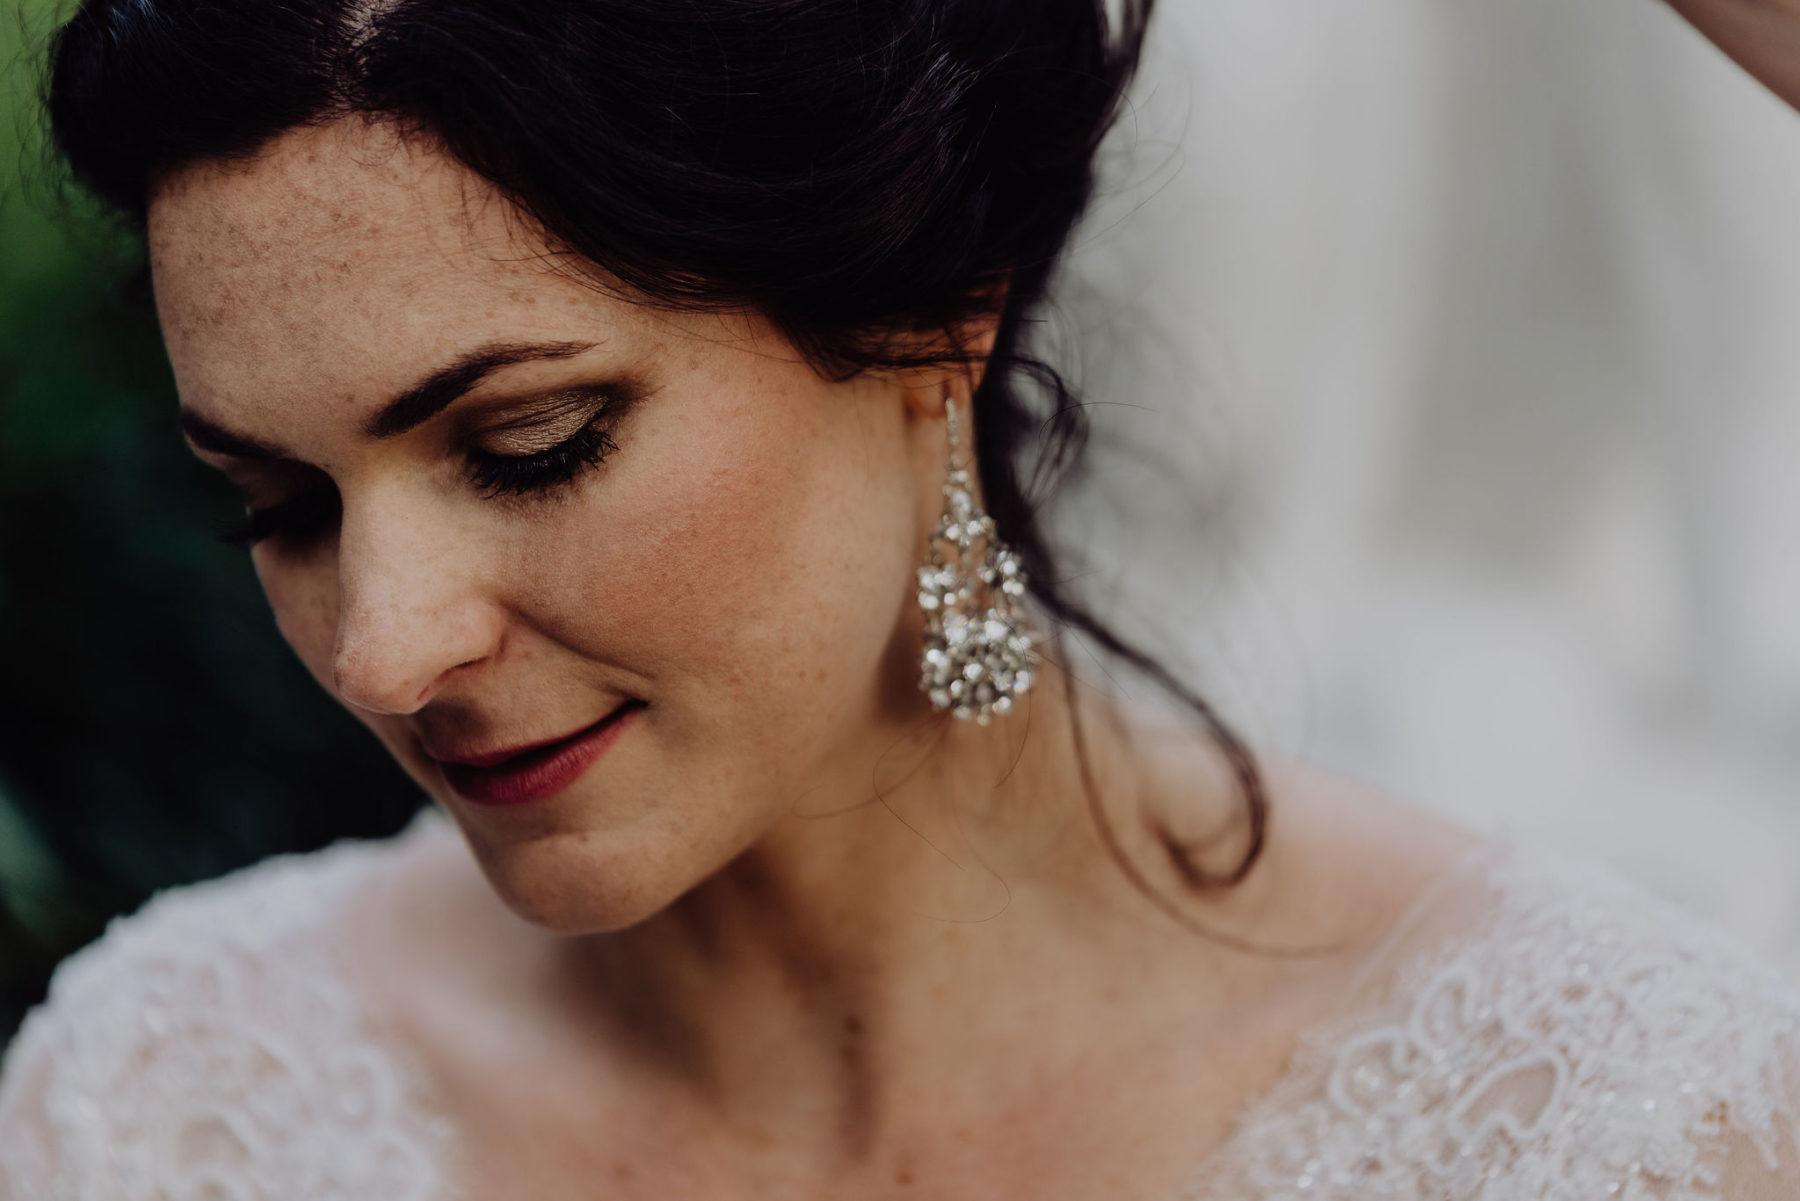 Nashville Makeup Artist: Indigo Beauty Collective featured on Nashville Bride Guide